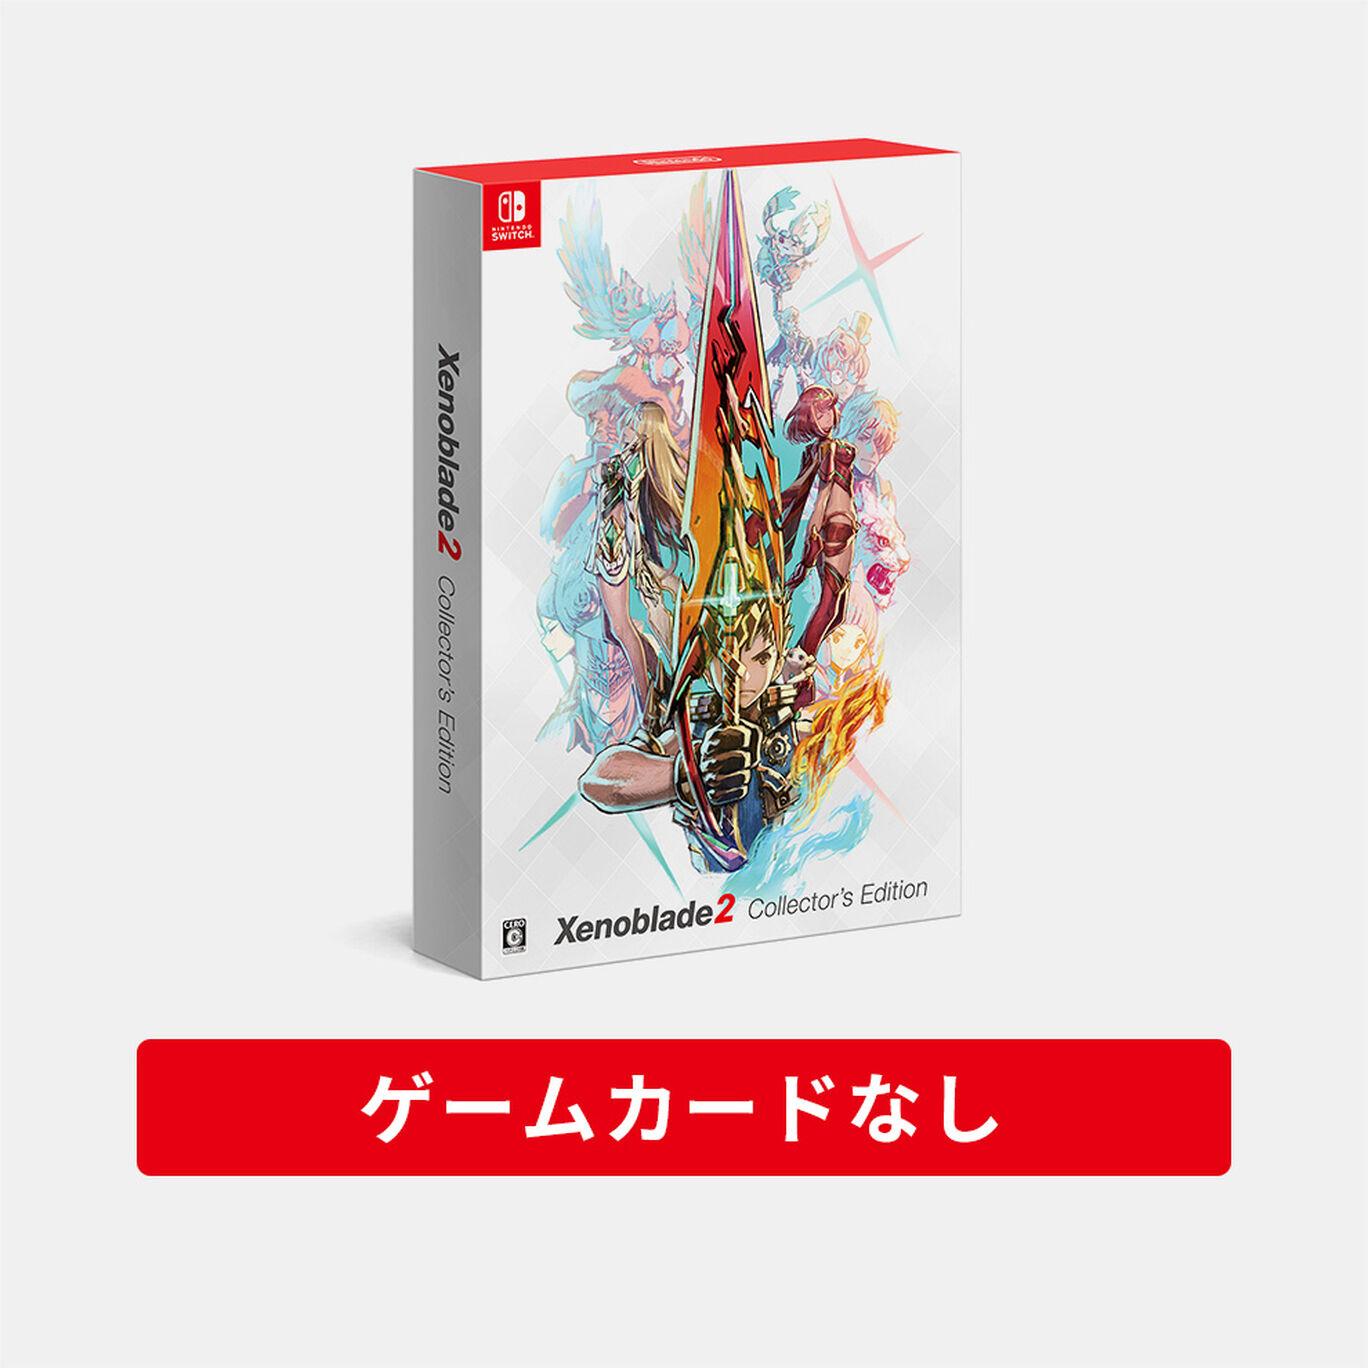 Xenoblade2 Collector's Edition(ゲームカードなし)※特典のみ